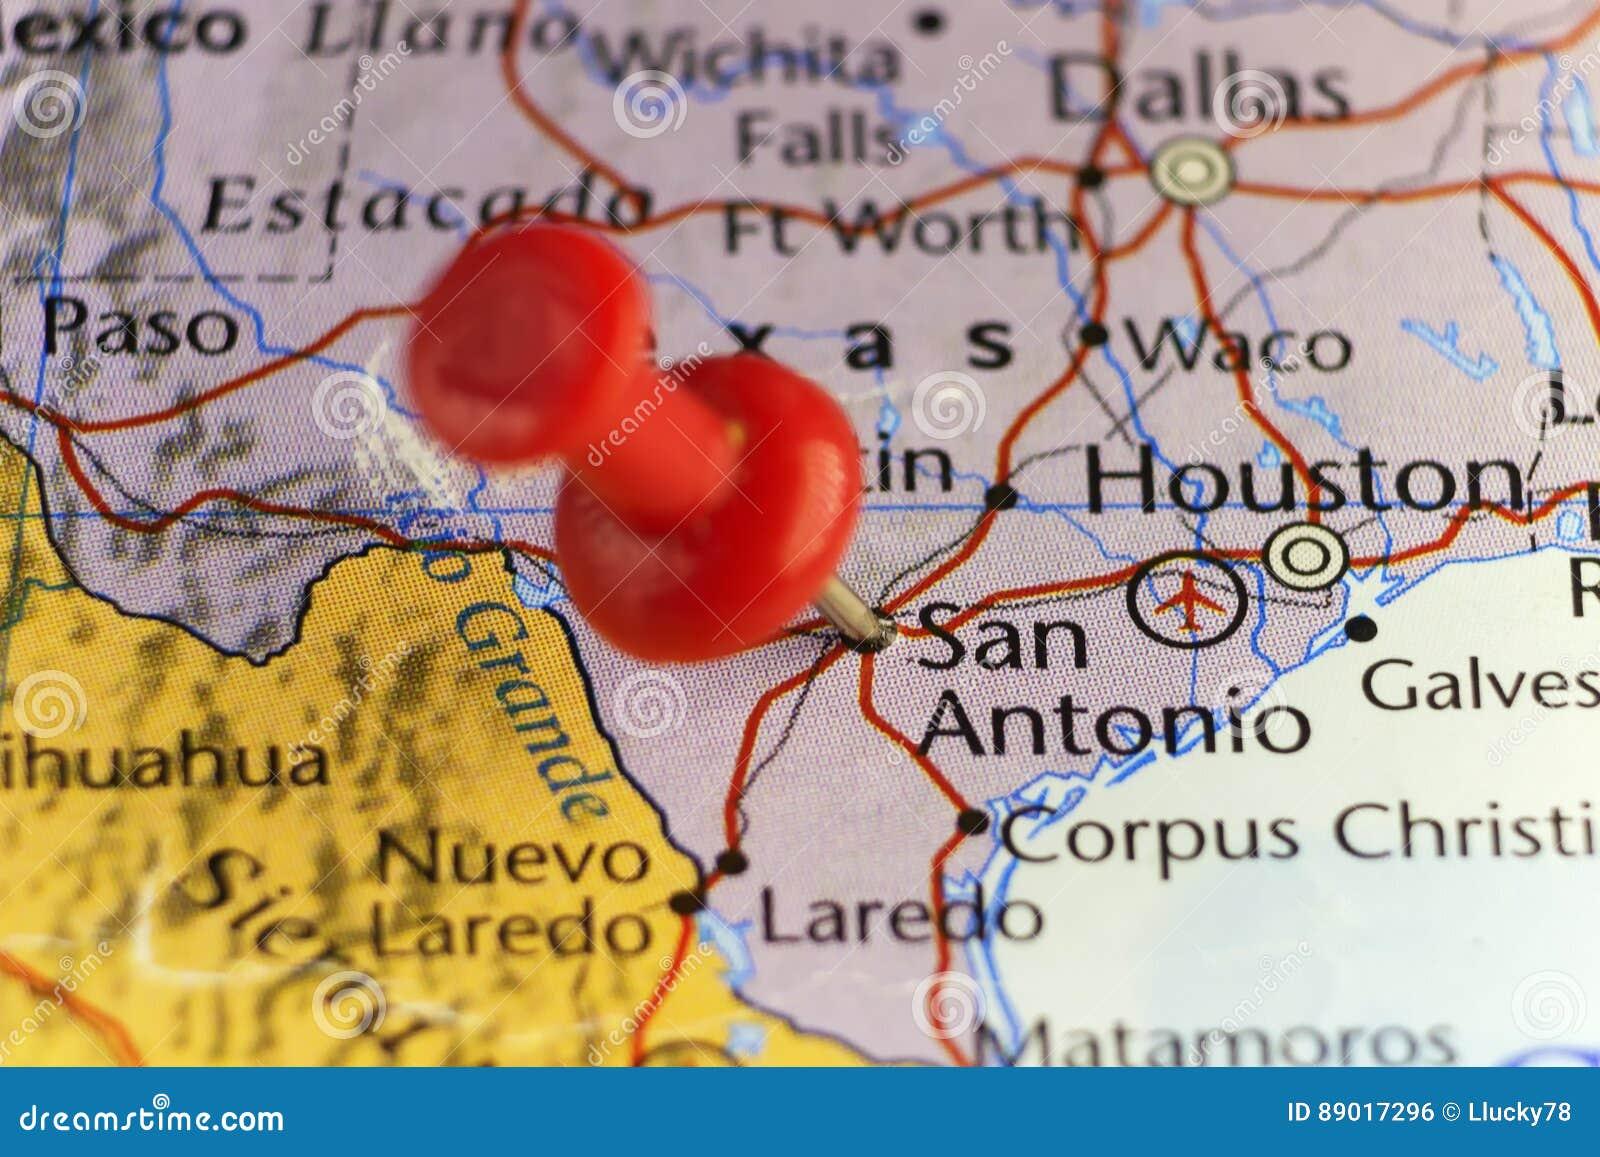 San Antonio Texas USA Pinned Map Stock Illustration ... on tallahassee usa map, olympia usa map, santa fe usa map, great plains usa map, deep south usa map, panama city usa map, st. louis usa map, daytona usa map, mcallen usa map, abilene usa map, tucson usa map, helena usa map, vancouver usa map, wichita usa map, cheyenne usa map, calgary usa map, tulsa usa map, cancun usa map, athens usa map, orlando usa map,